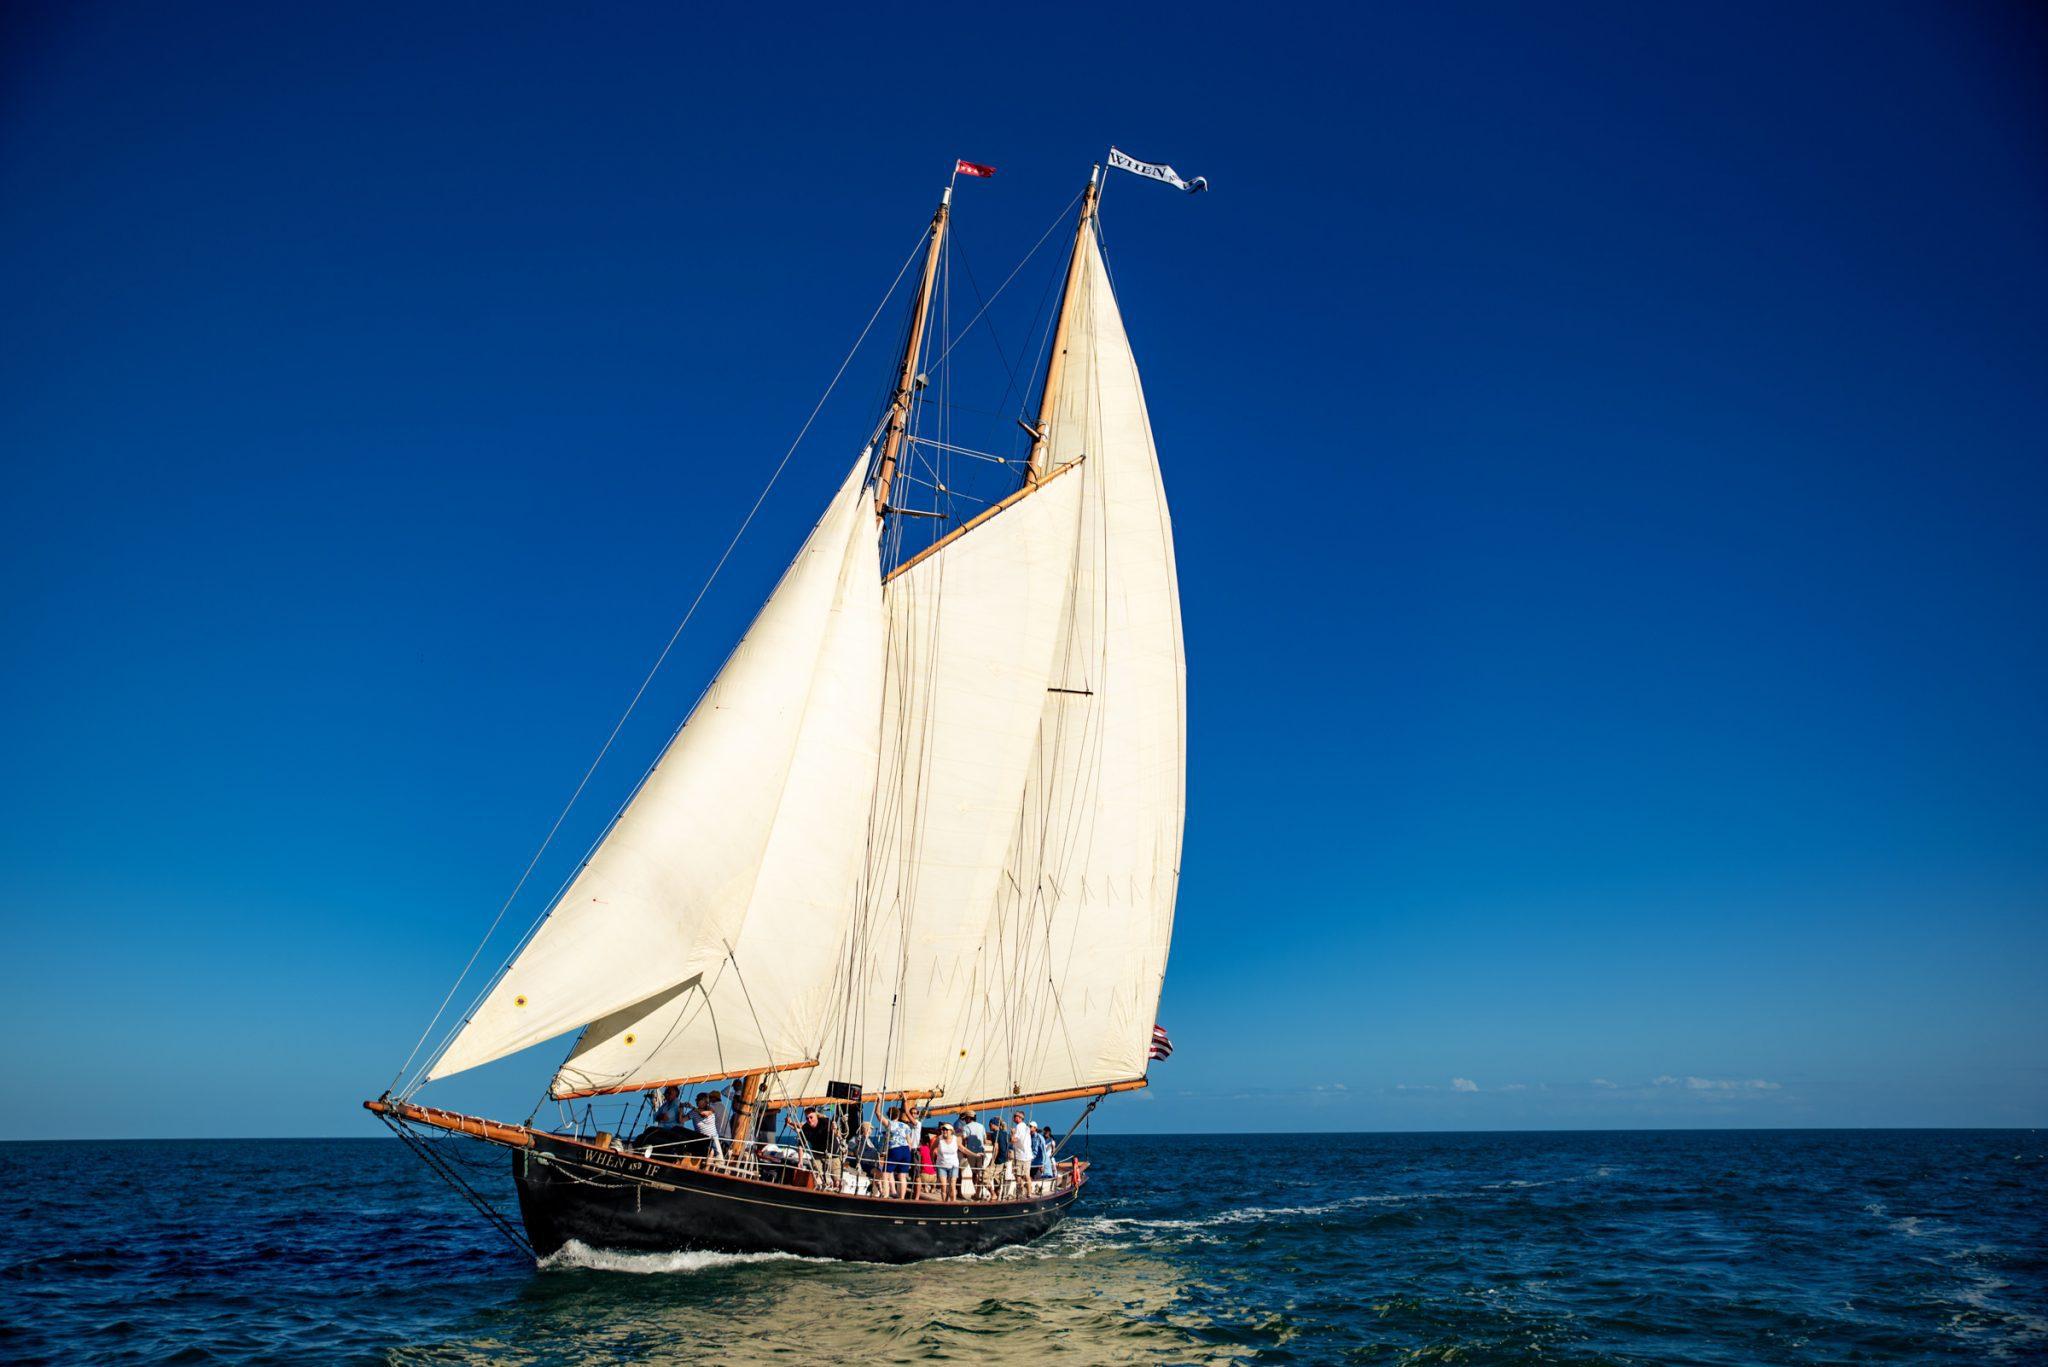 Sailboat in the florida keys